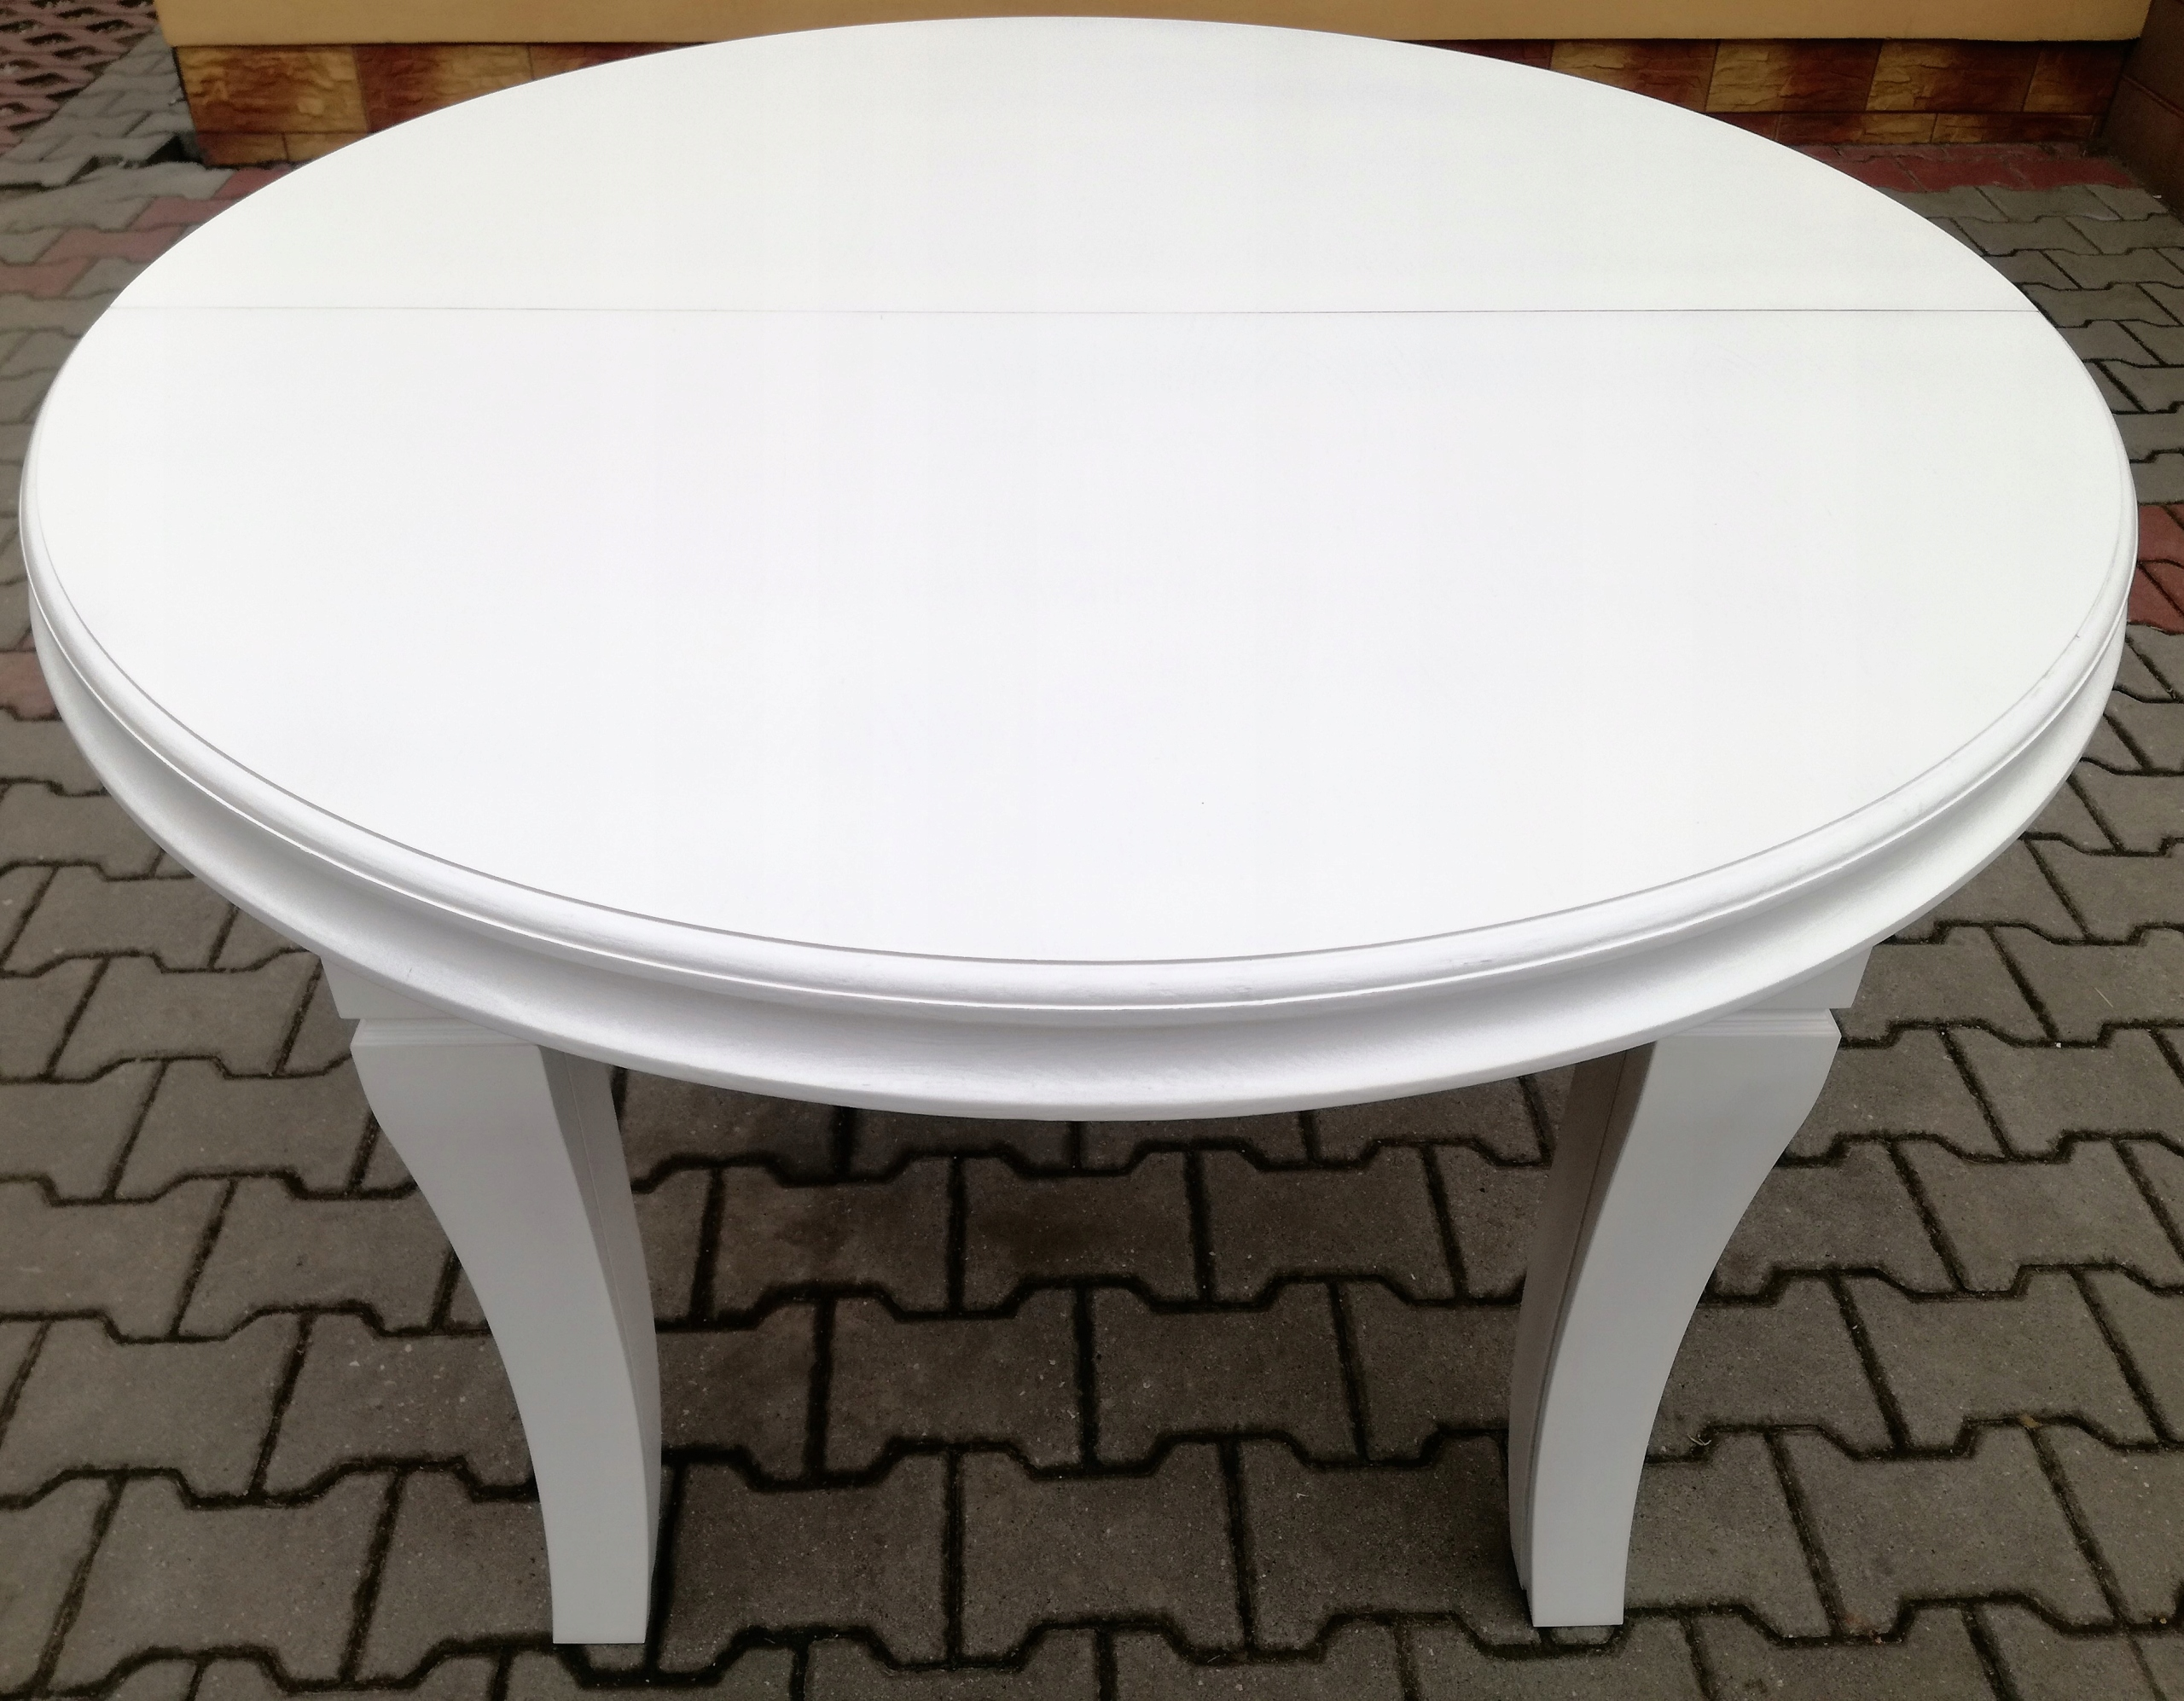 Rozkladací stôl, biely, 150 cm x 450 cm, 8 nožičiek